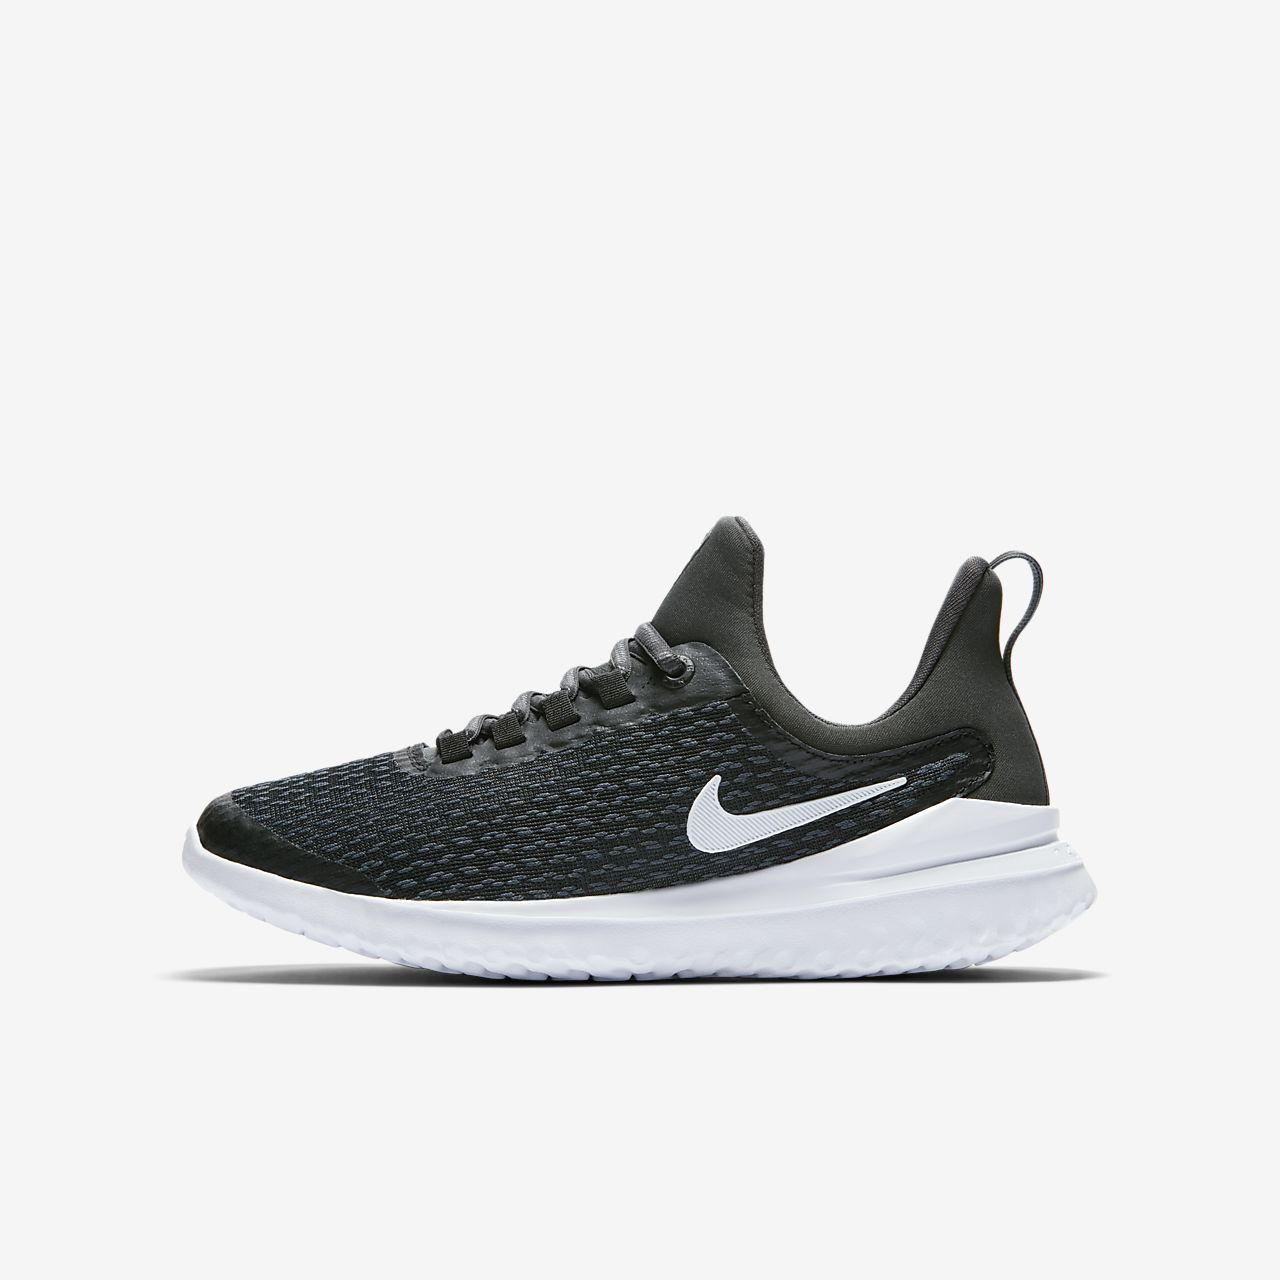 Calzado de running para niños talla grande Nike Renew Rival